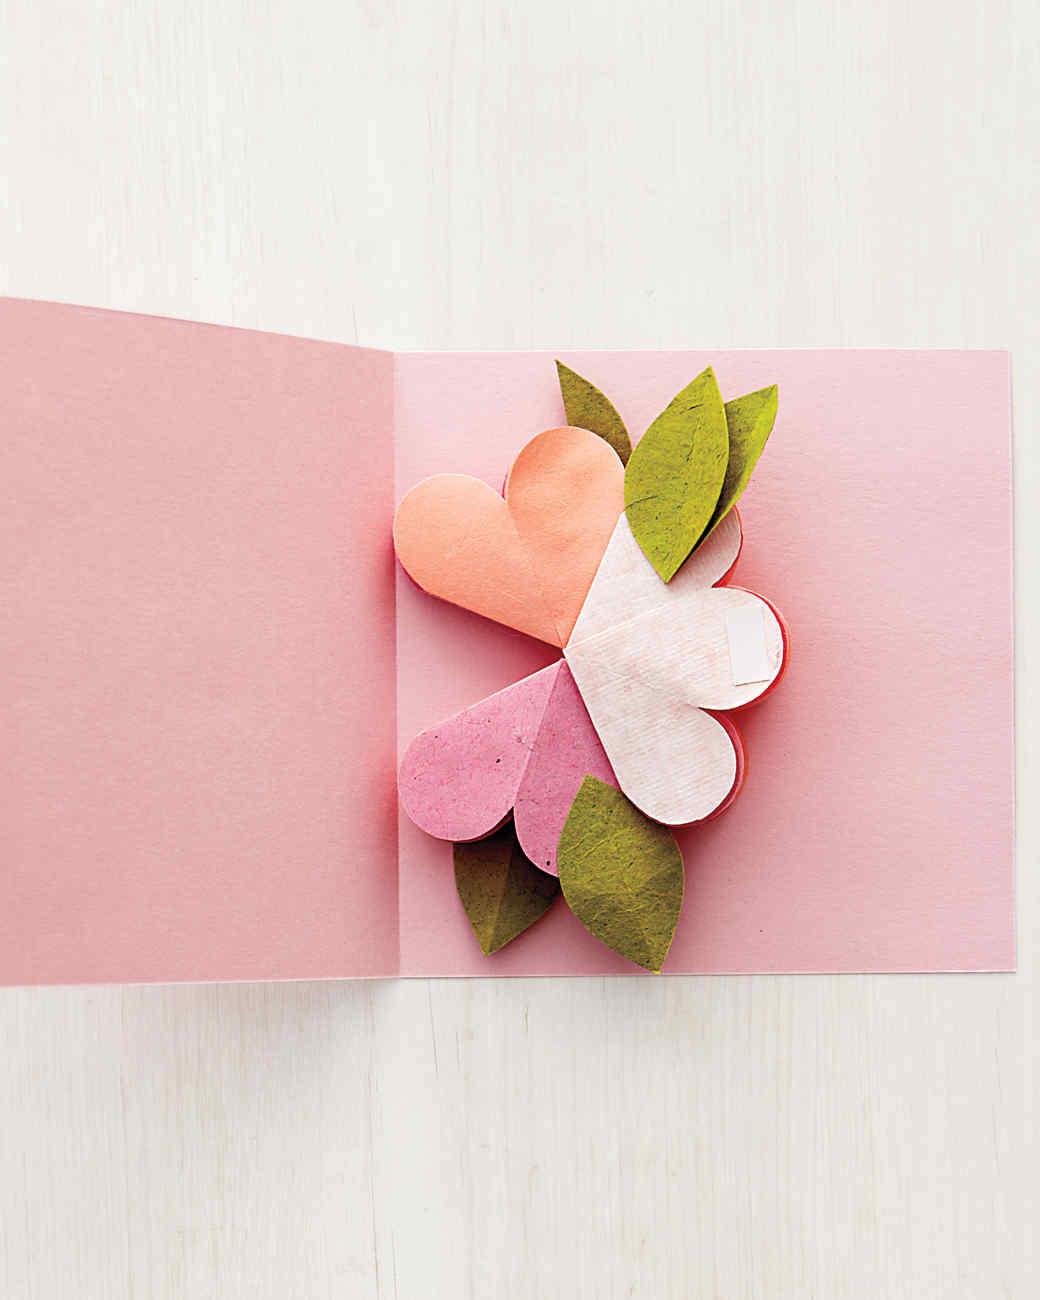 pop-up-card-cardht1-0511mld107231.jpg